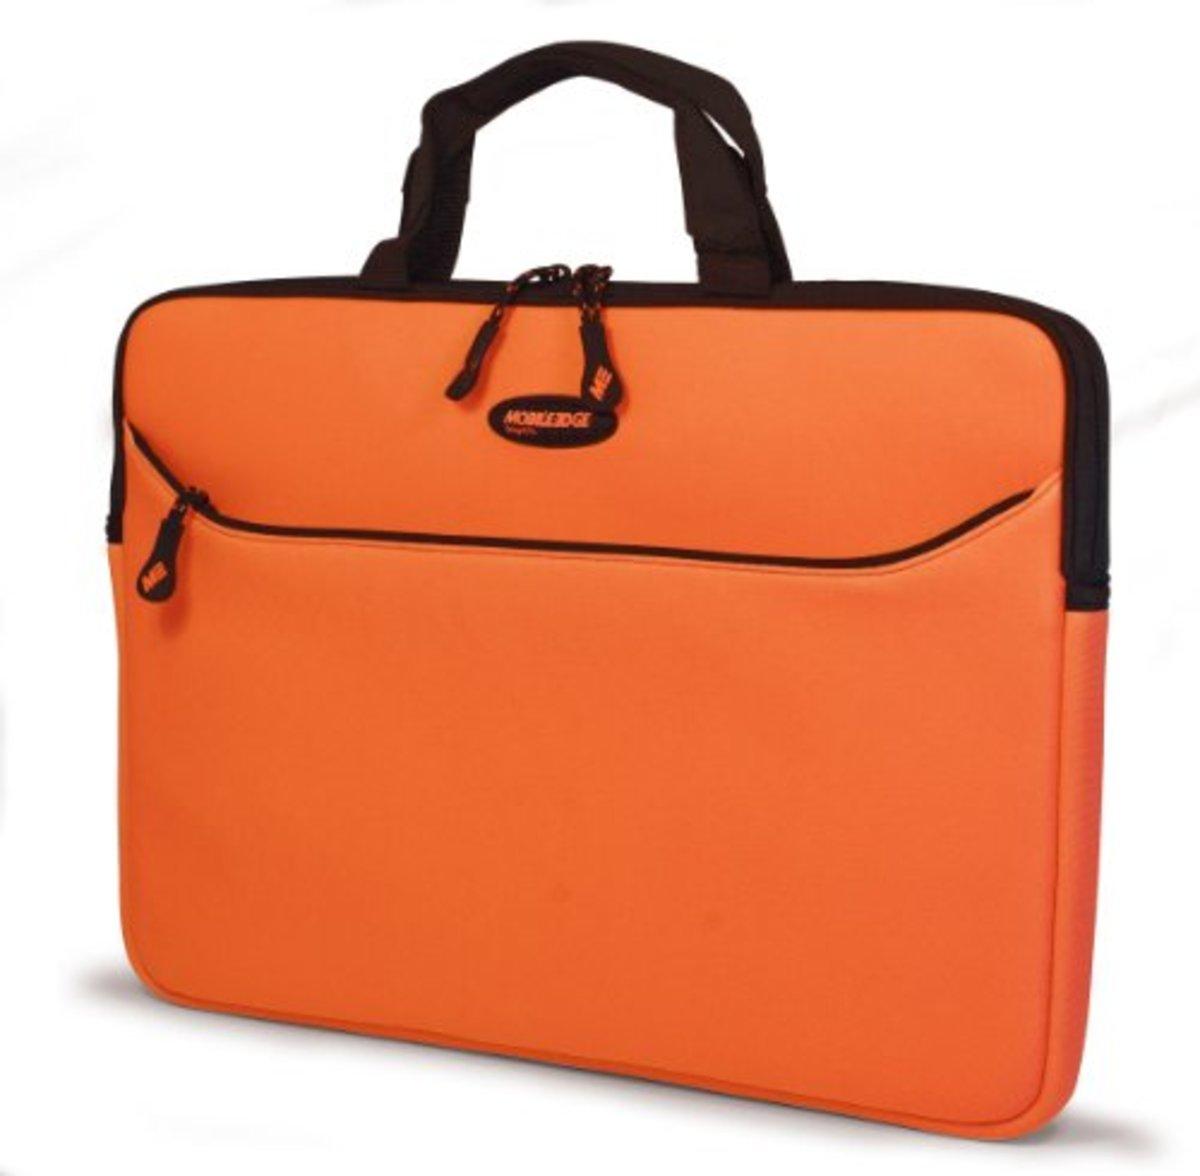 "Mobile Edge Neoprene Laptop Sleeve - 17.3"" PC - Orange"